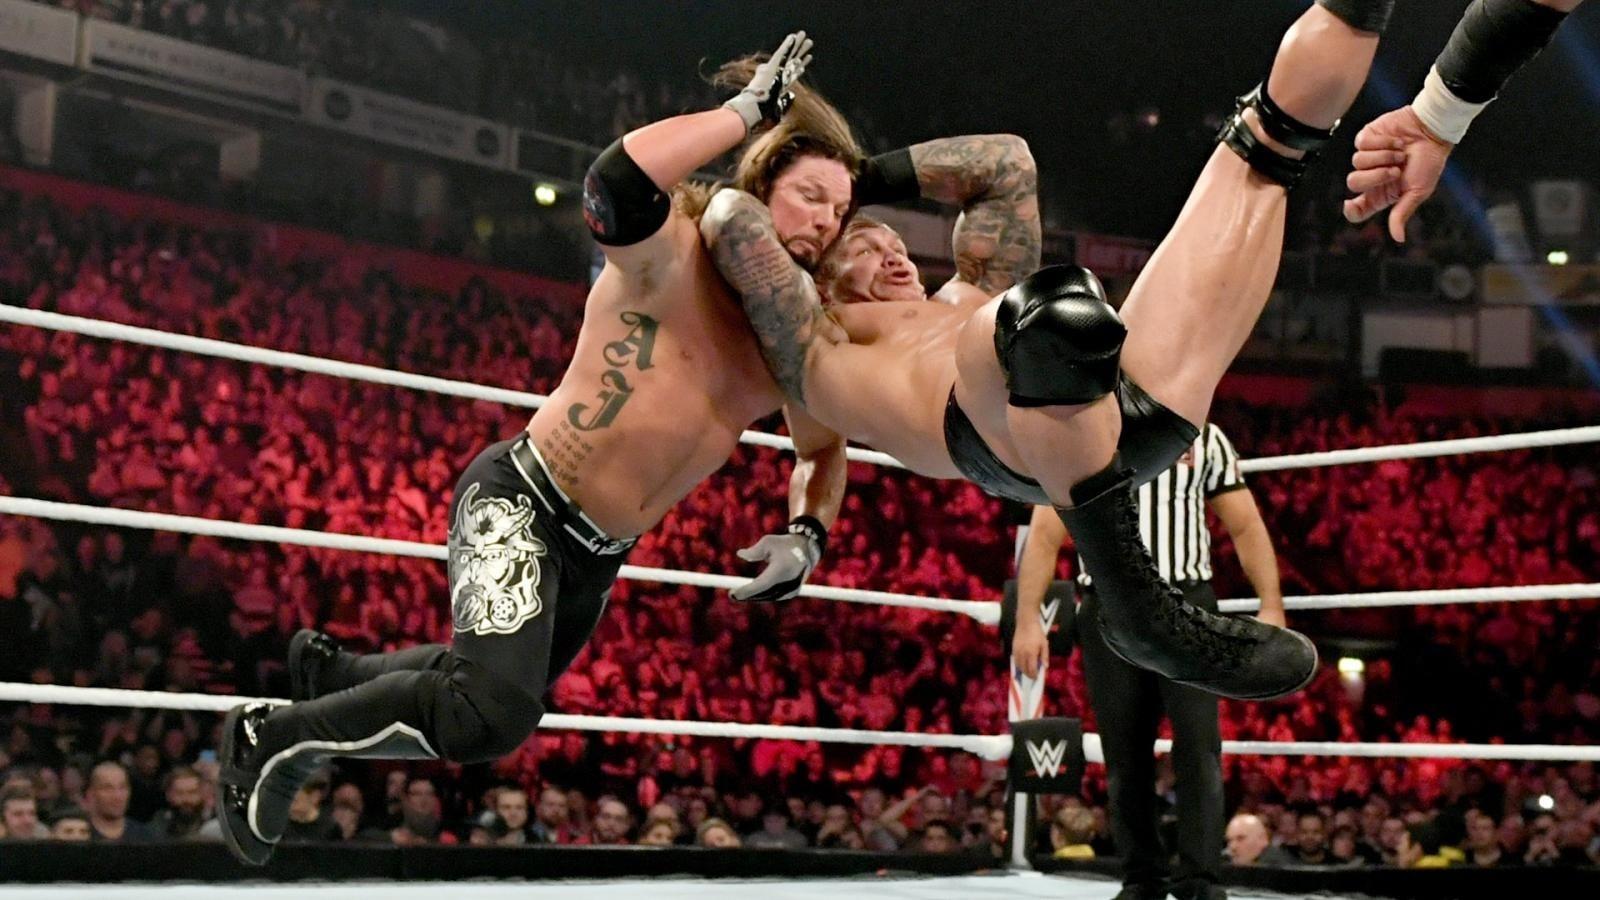 WWE Raw Season 27 :Episode 45  November 11, 2019 (Manchester, UK)